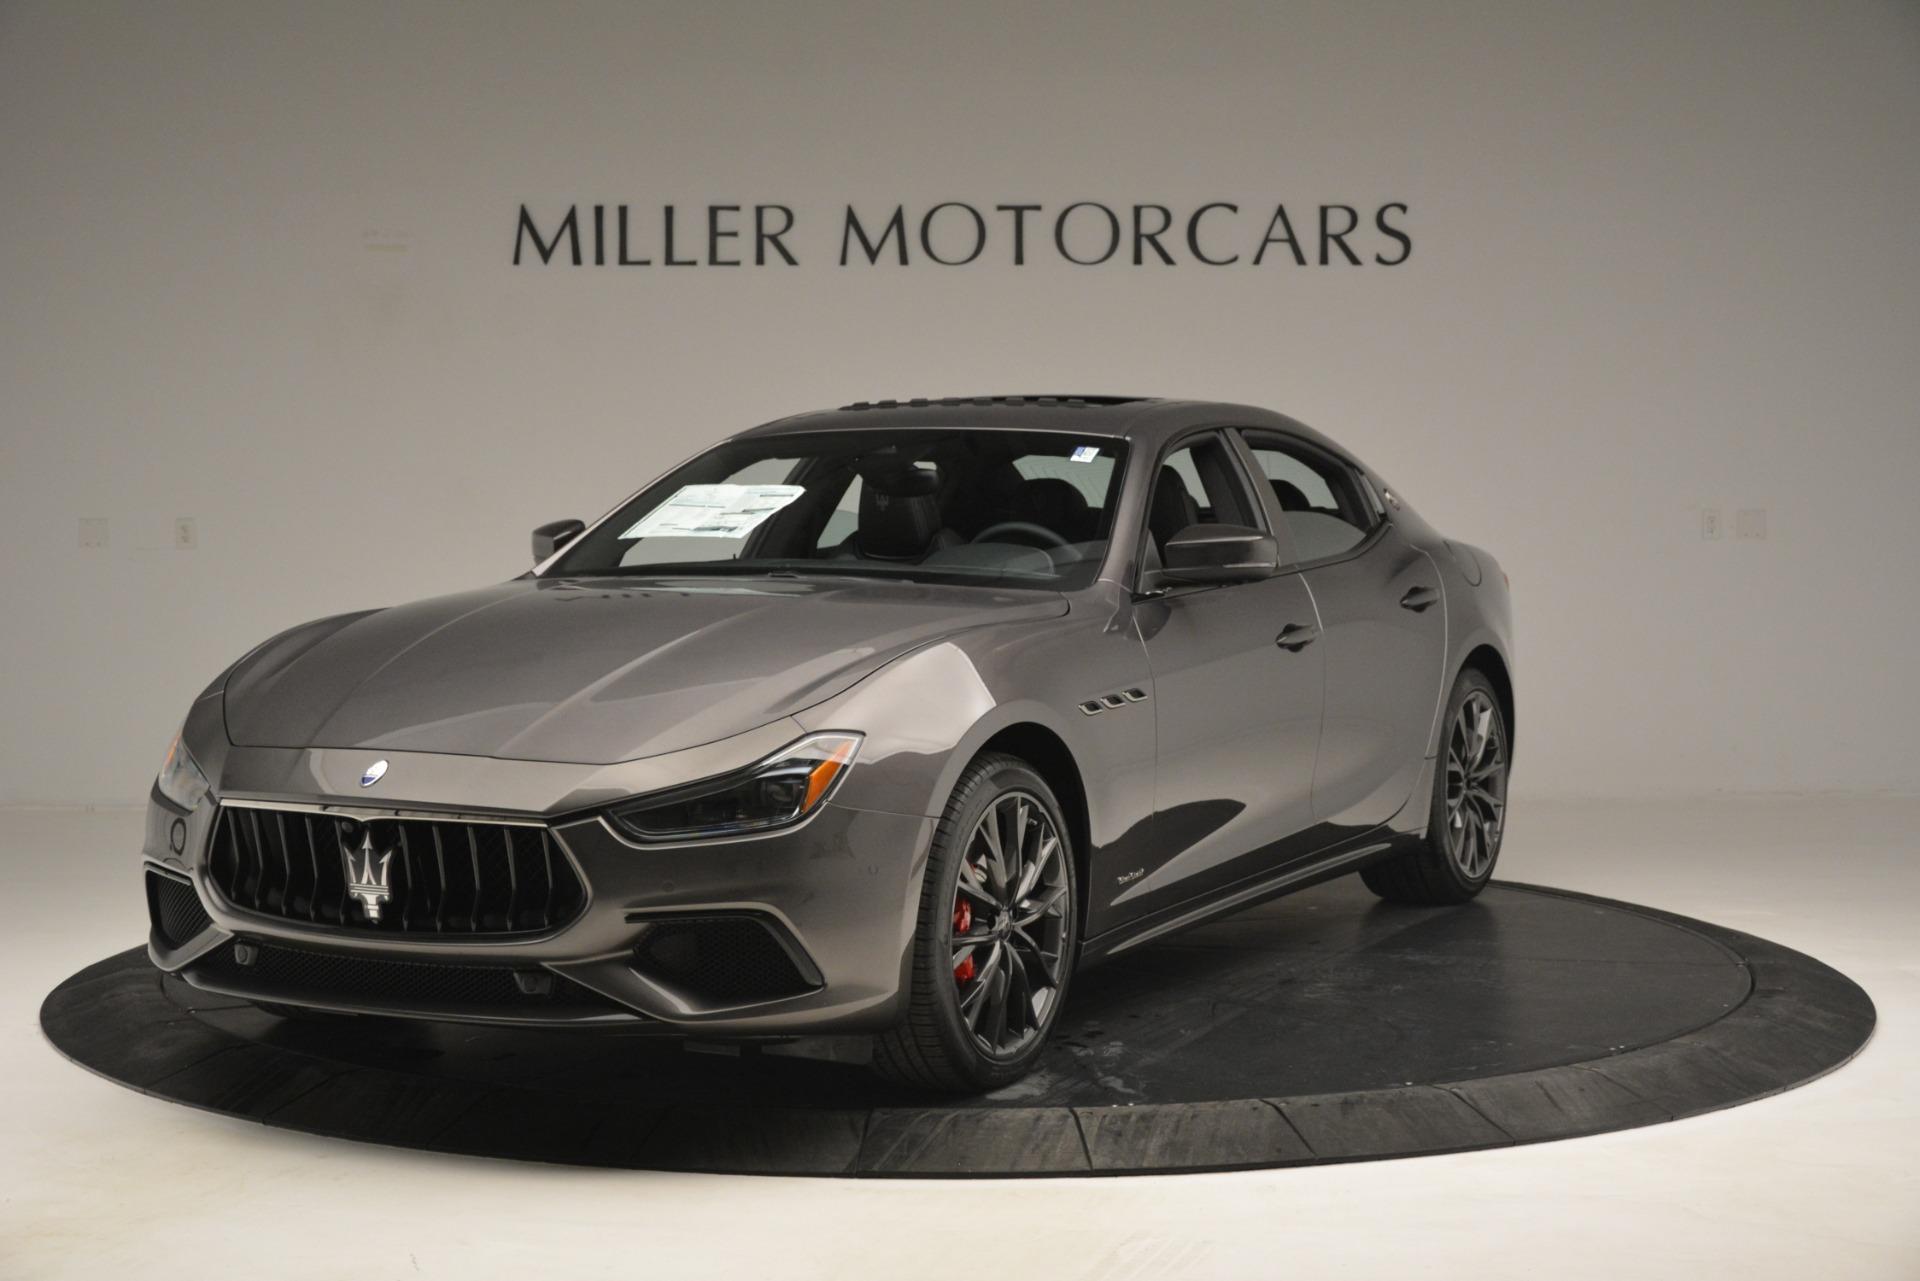 New 2019 Maserati Ghibli S Q4 GranSport For Sale In Greenwich, CT 2925_main